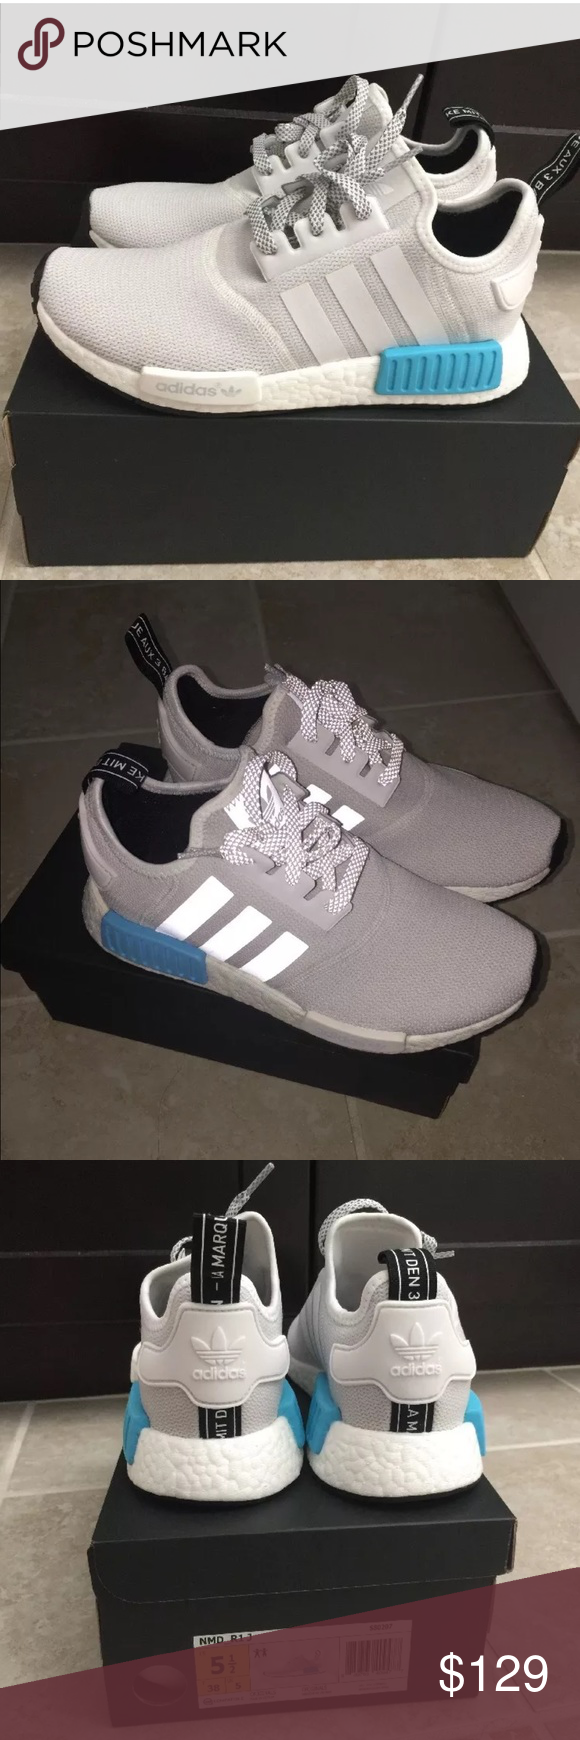 Adidas nmd r1 bianco blu gs wmns 7 nwt la posh sceglie